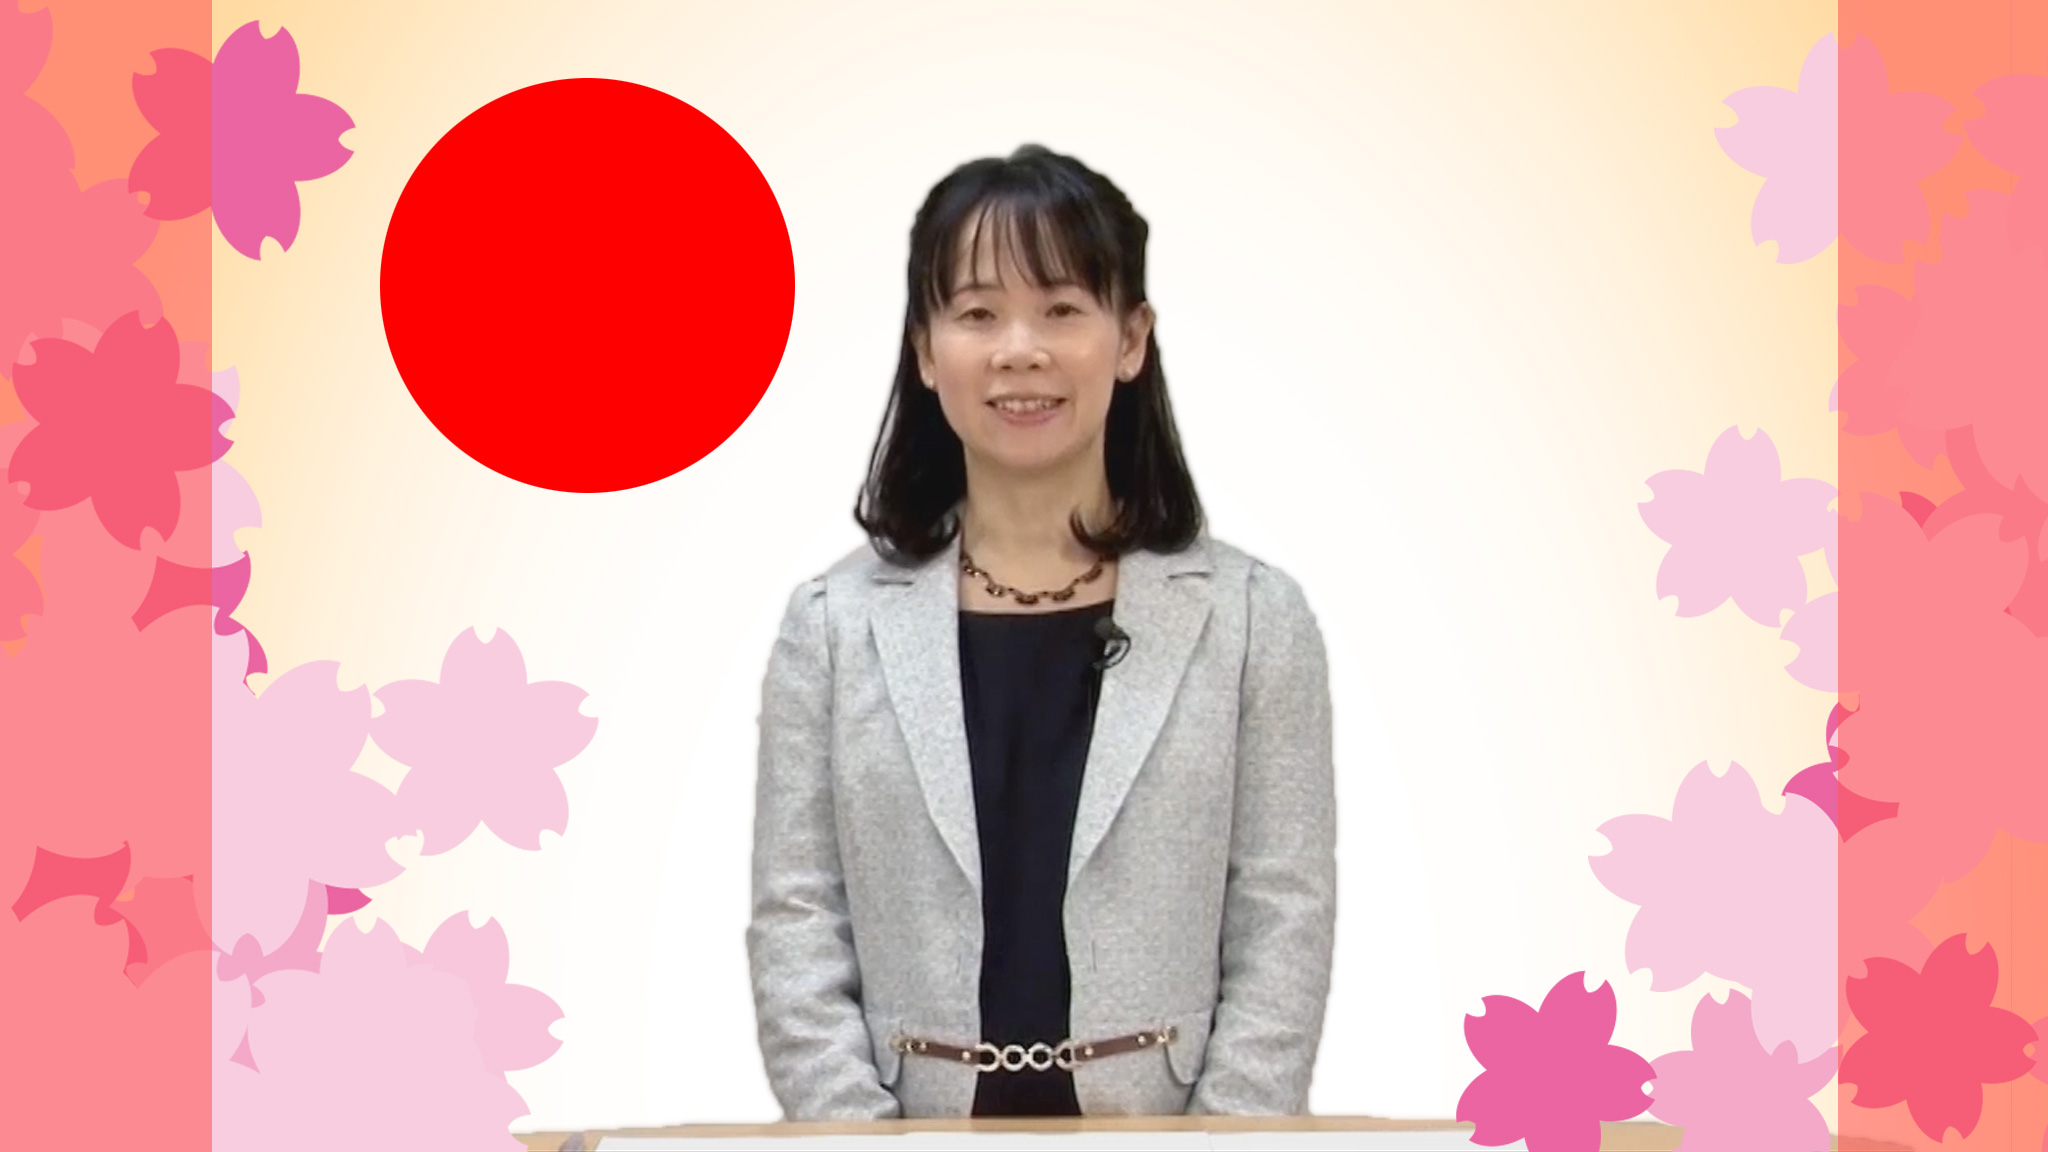 鯉渕 裕子 Yuko Koibuchi